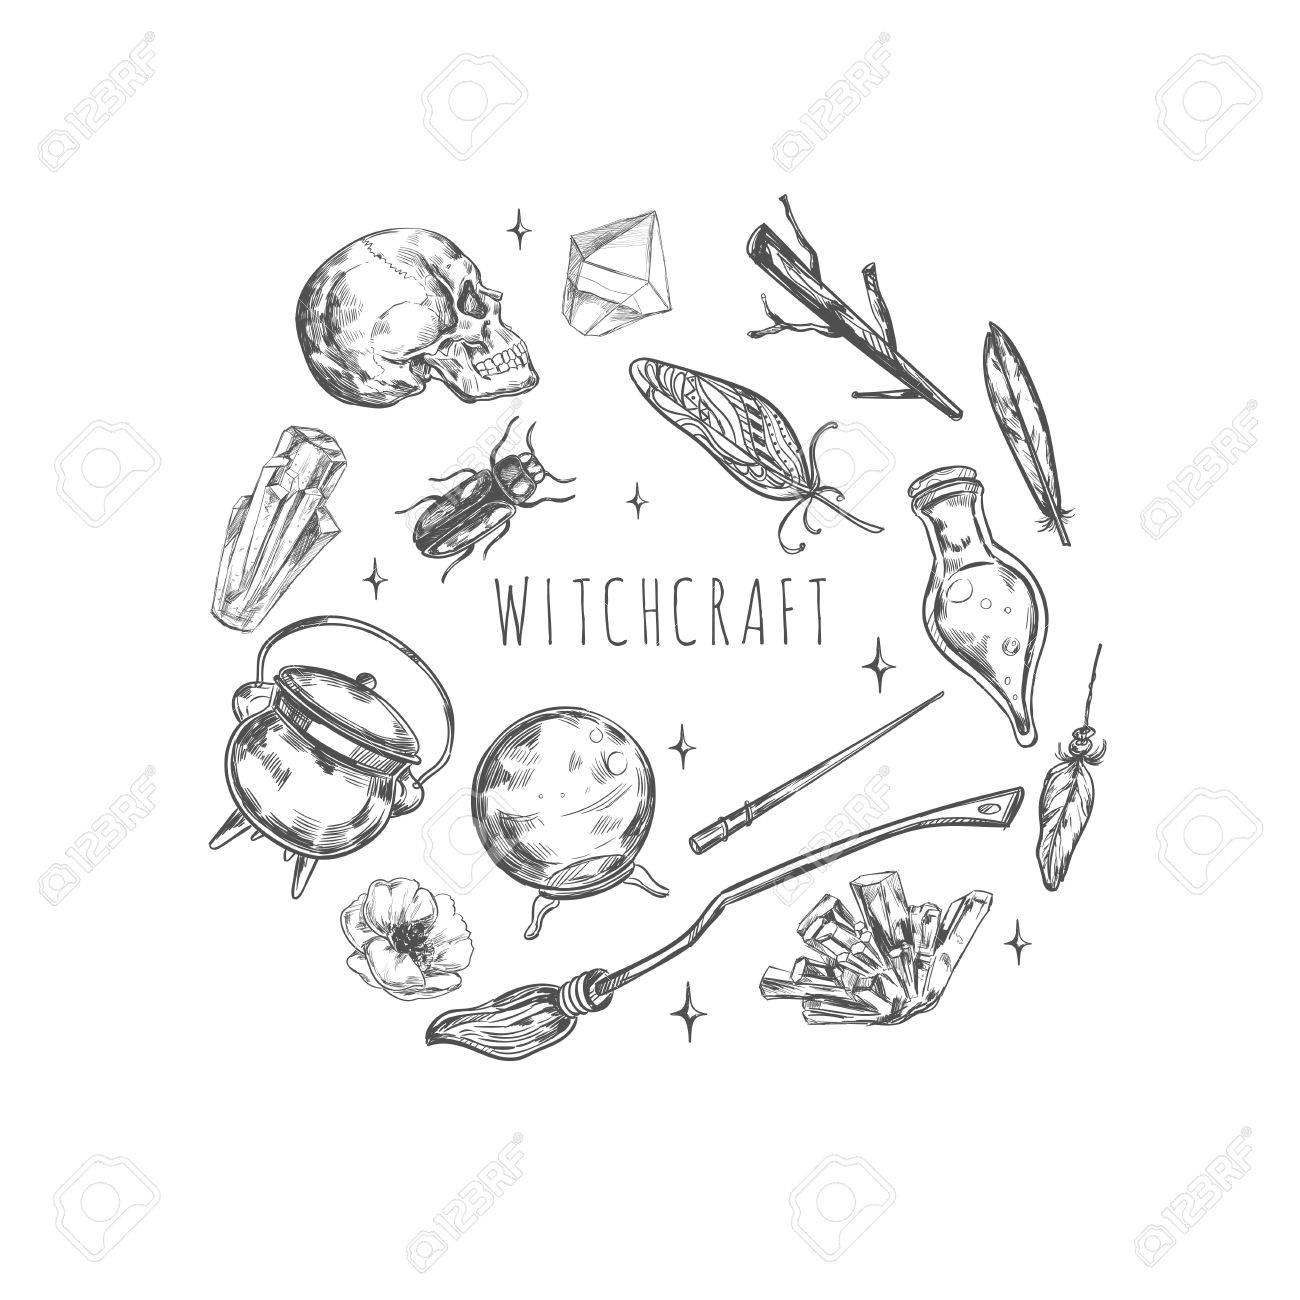 Hand drawn magic set illustration wizardry witchcraft symbols hand drawn magic set illustration wizardry witchcraft symbols isolated icons collection cartoon sorcery concept buycottarizona